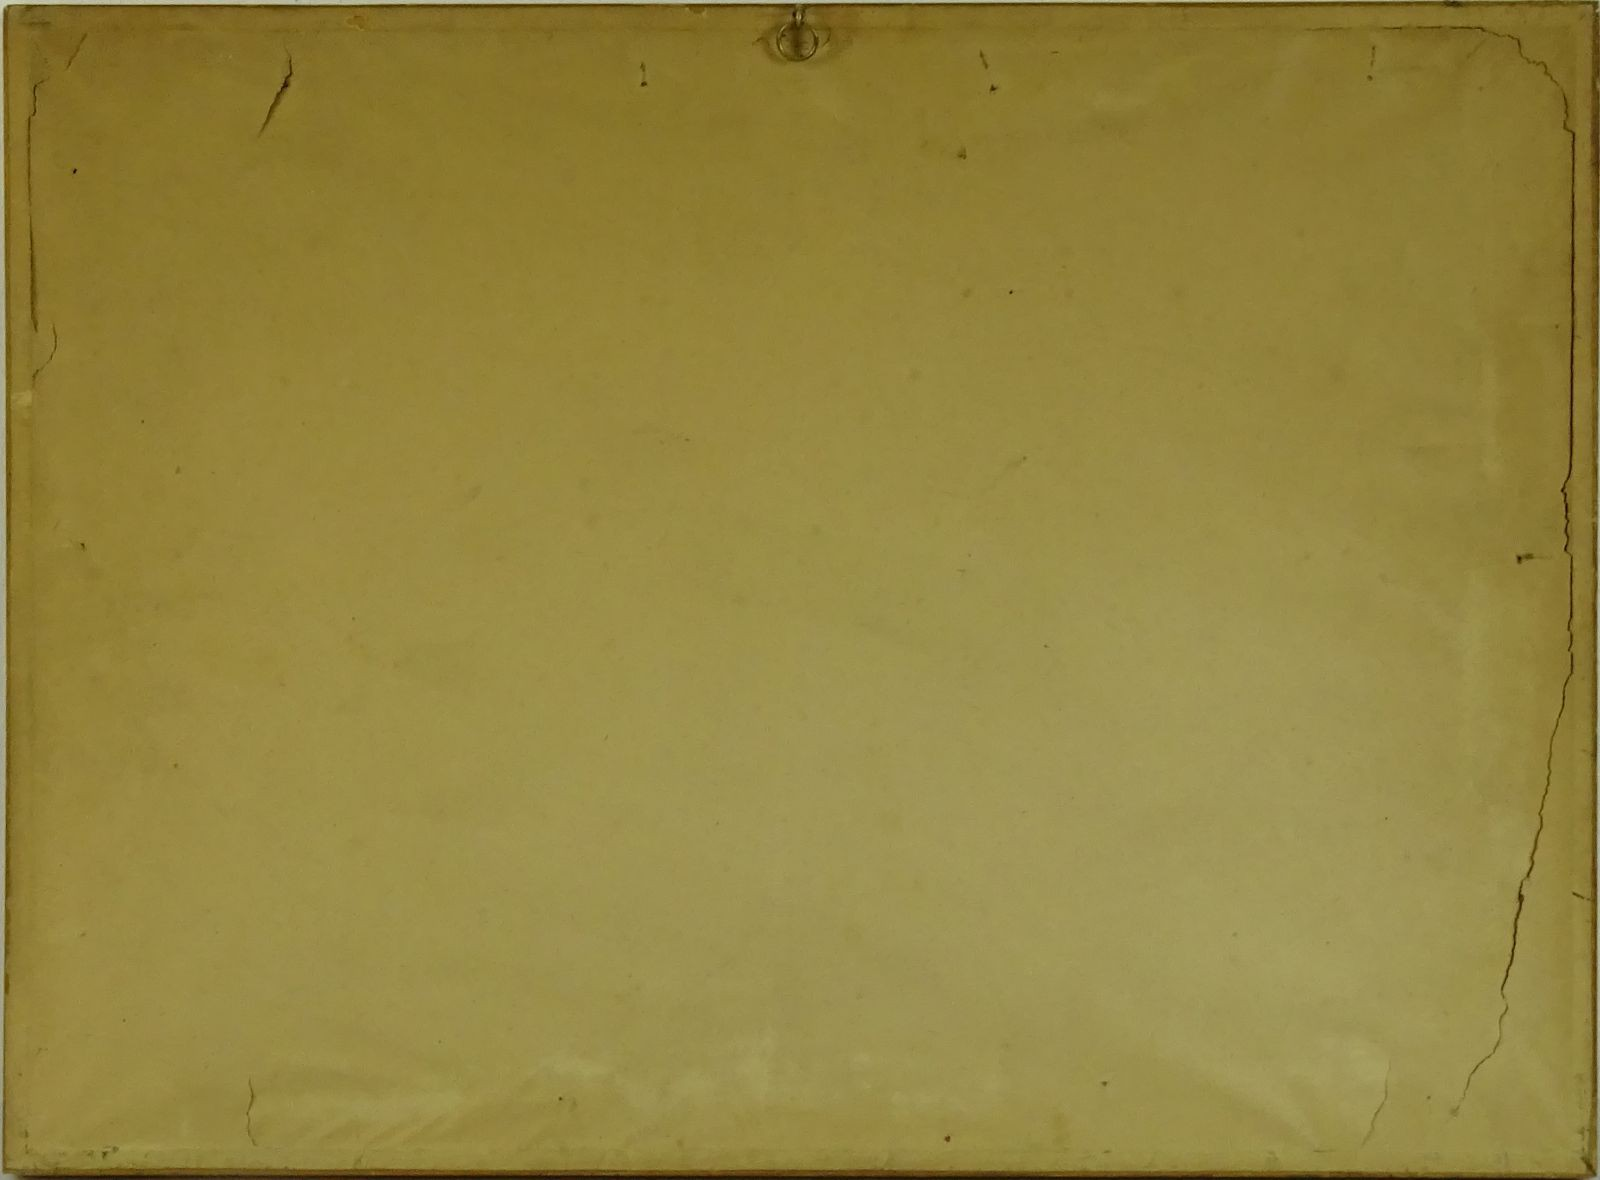 DSC05336.JPG (1600×1180)